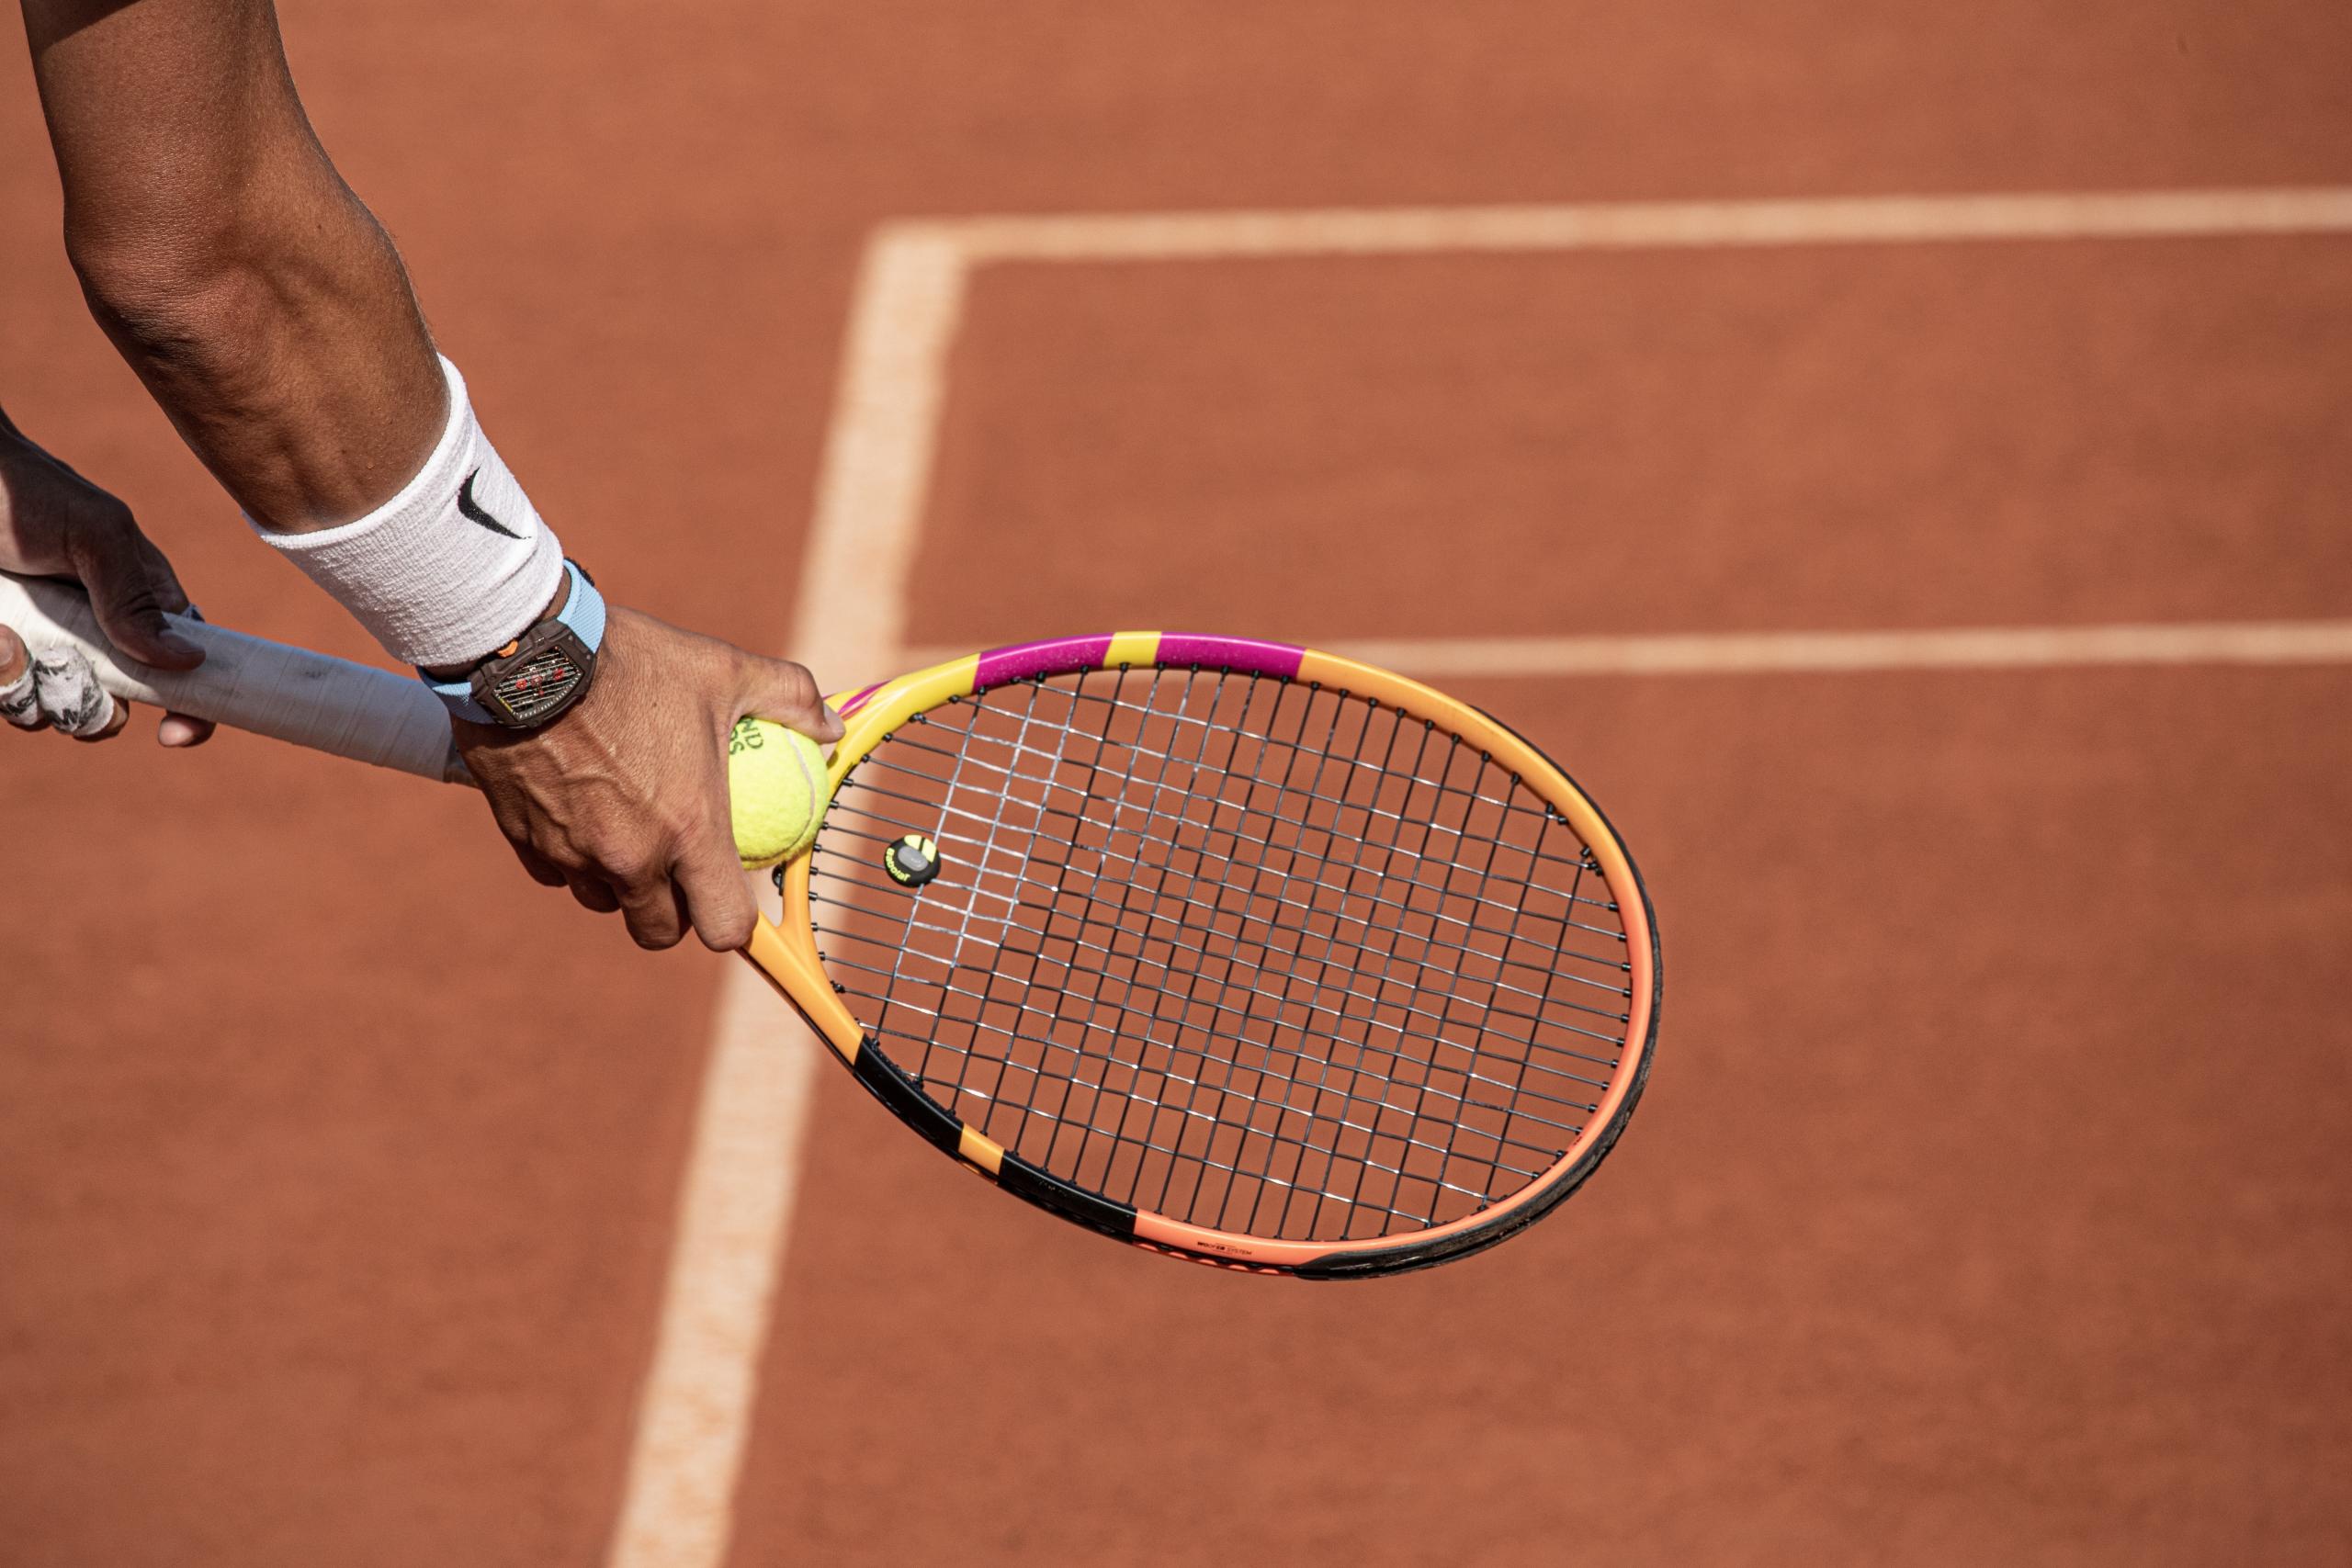 Rafael Nadal RM 27-04 Tourbillon